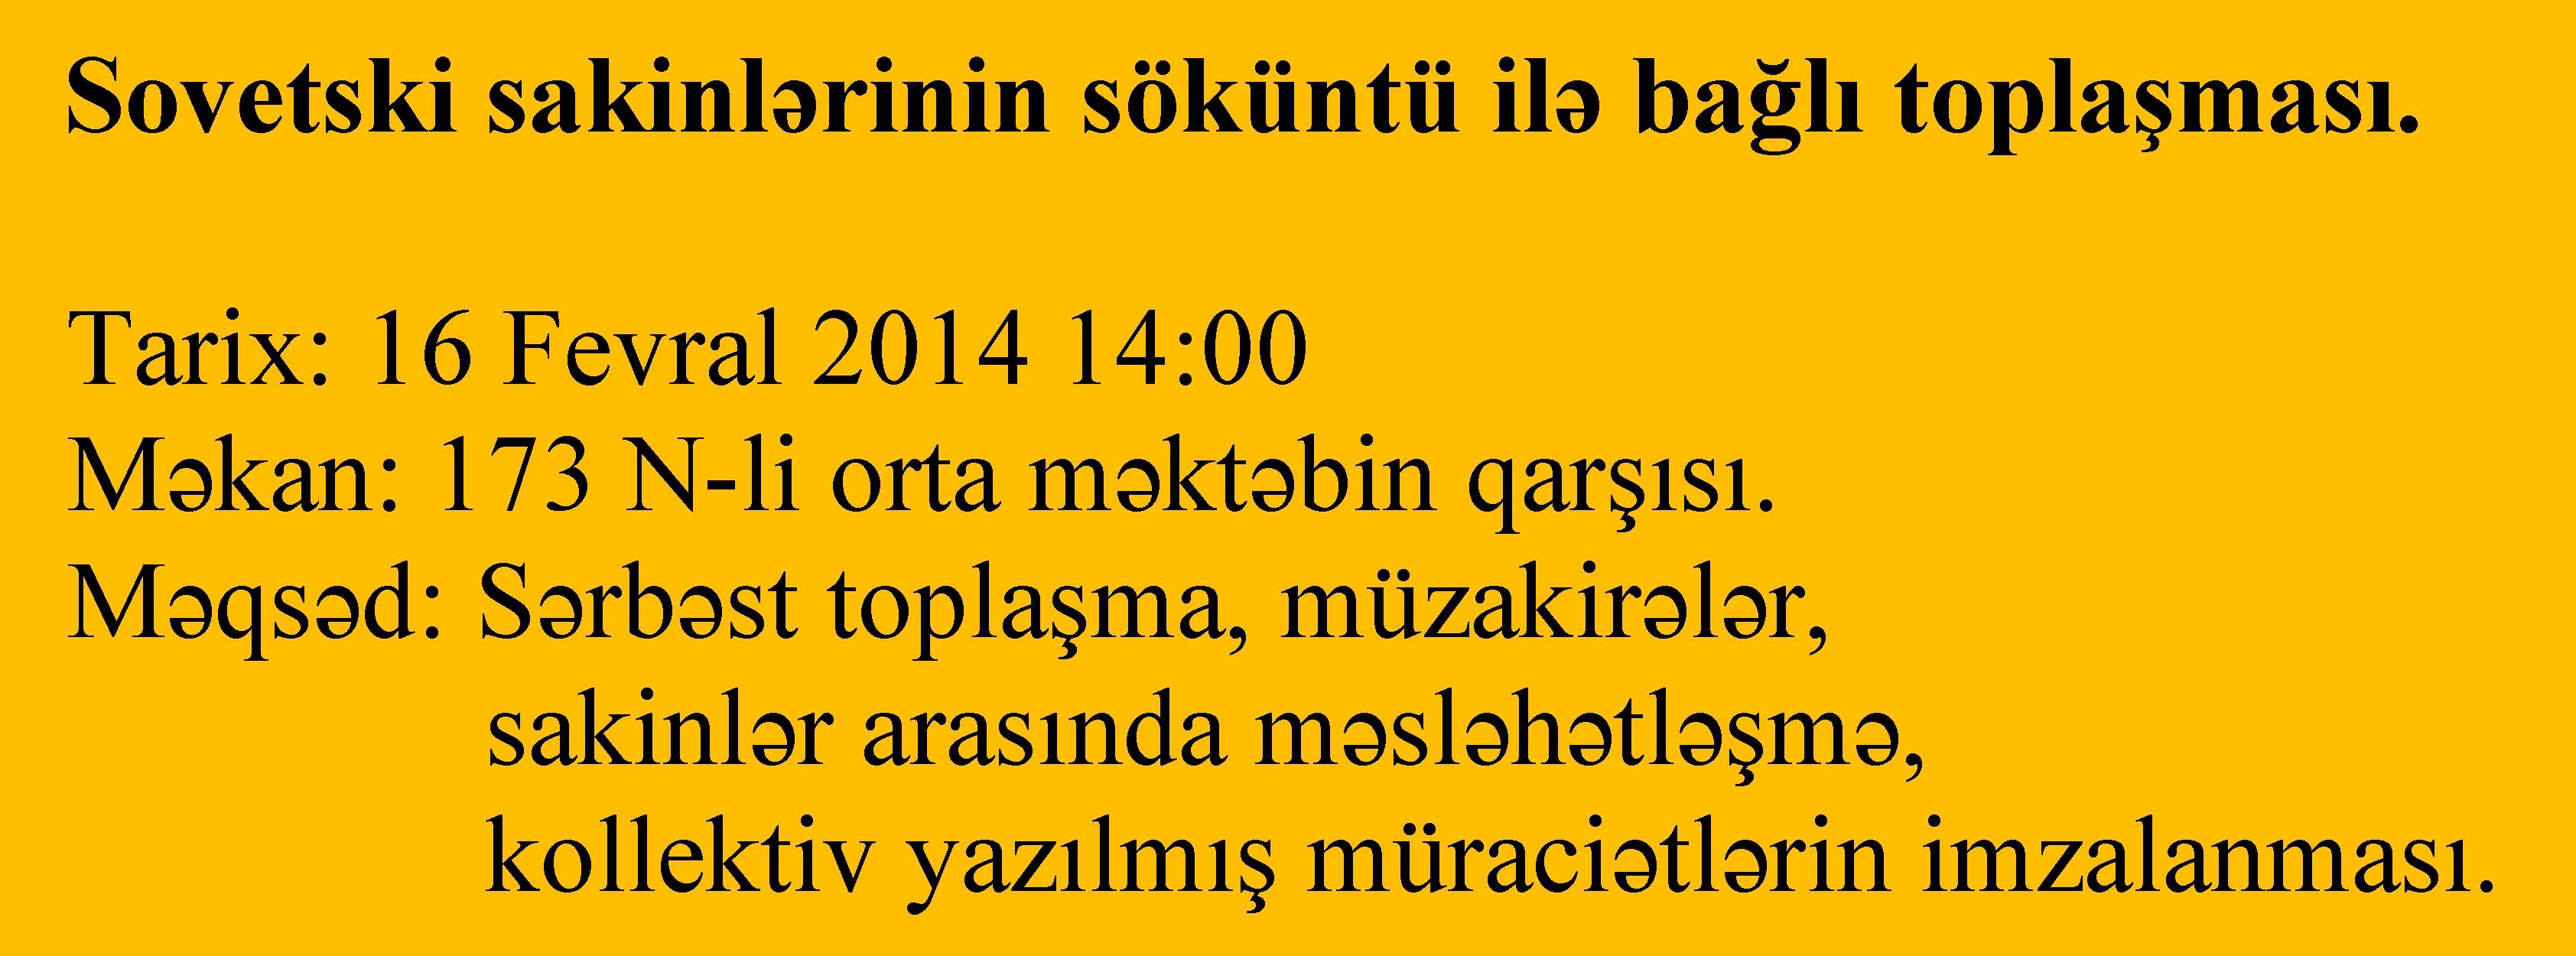 64577_sovetski_iclas.jpg